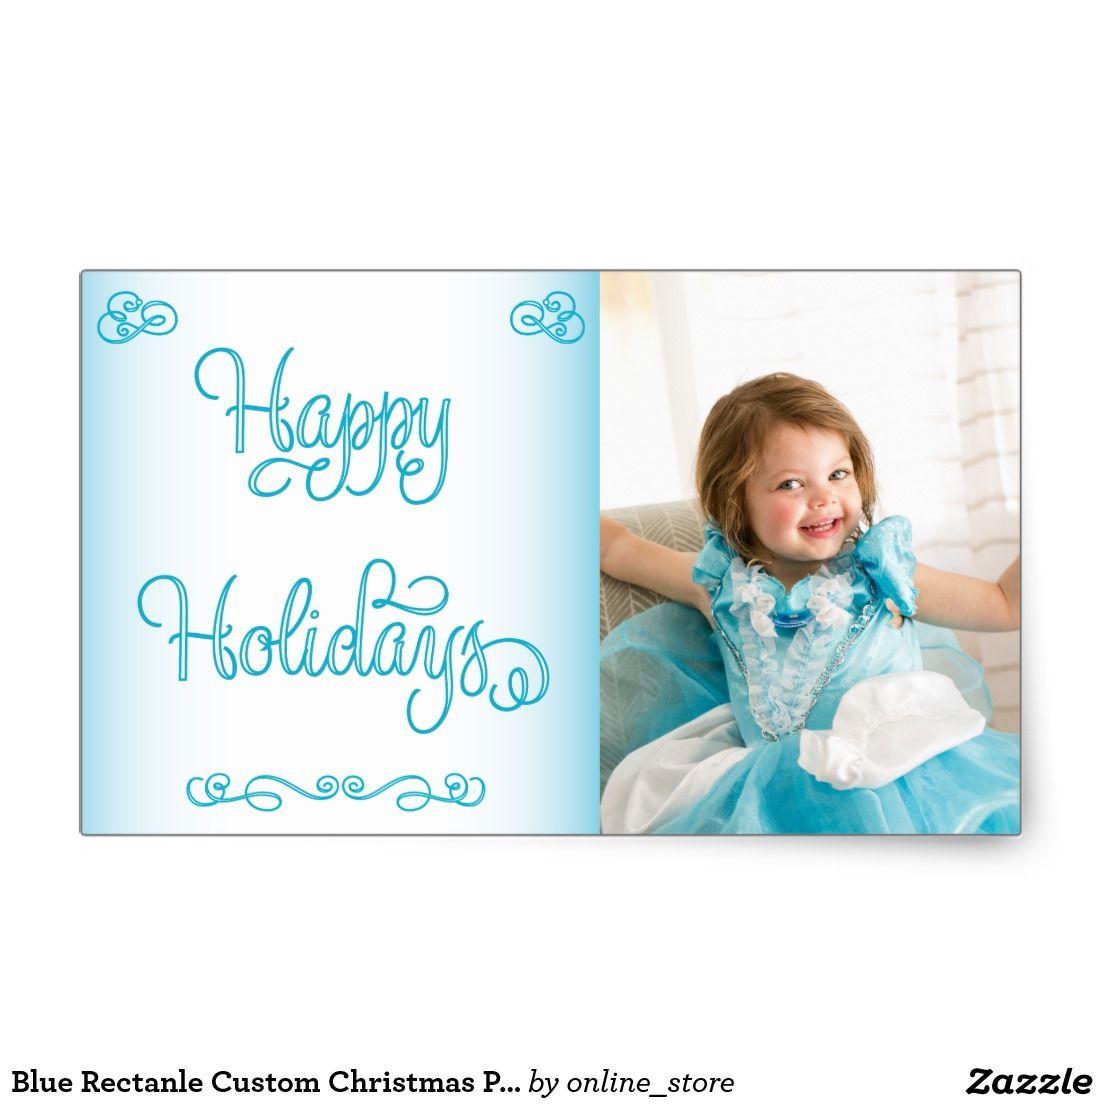 Blue Rectanle Custom Christmas Photo Stickers